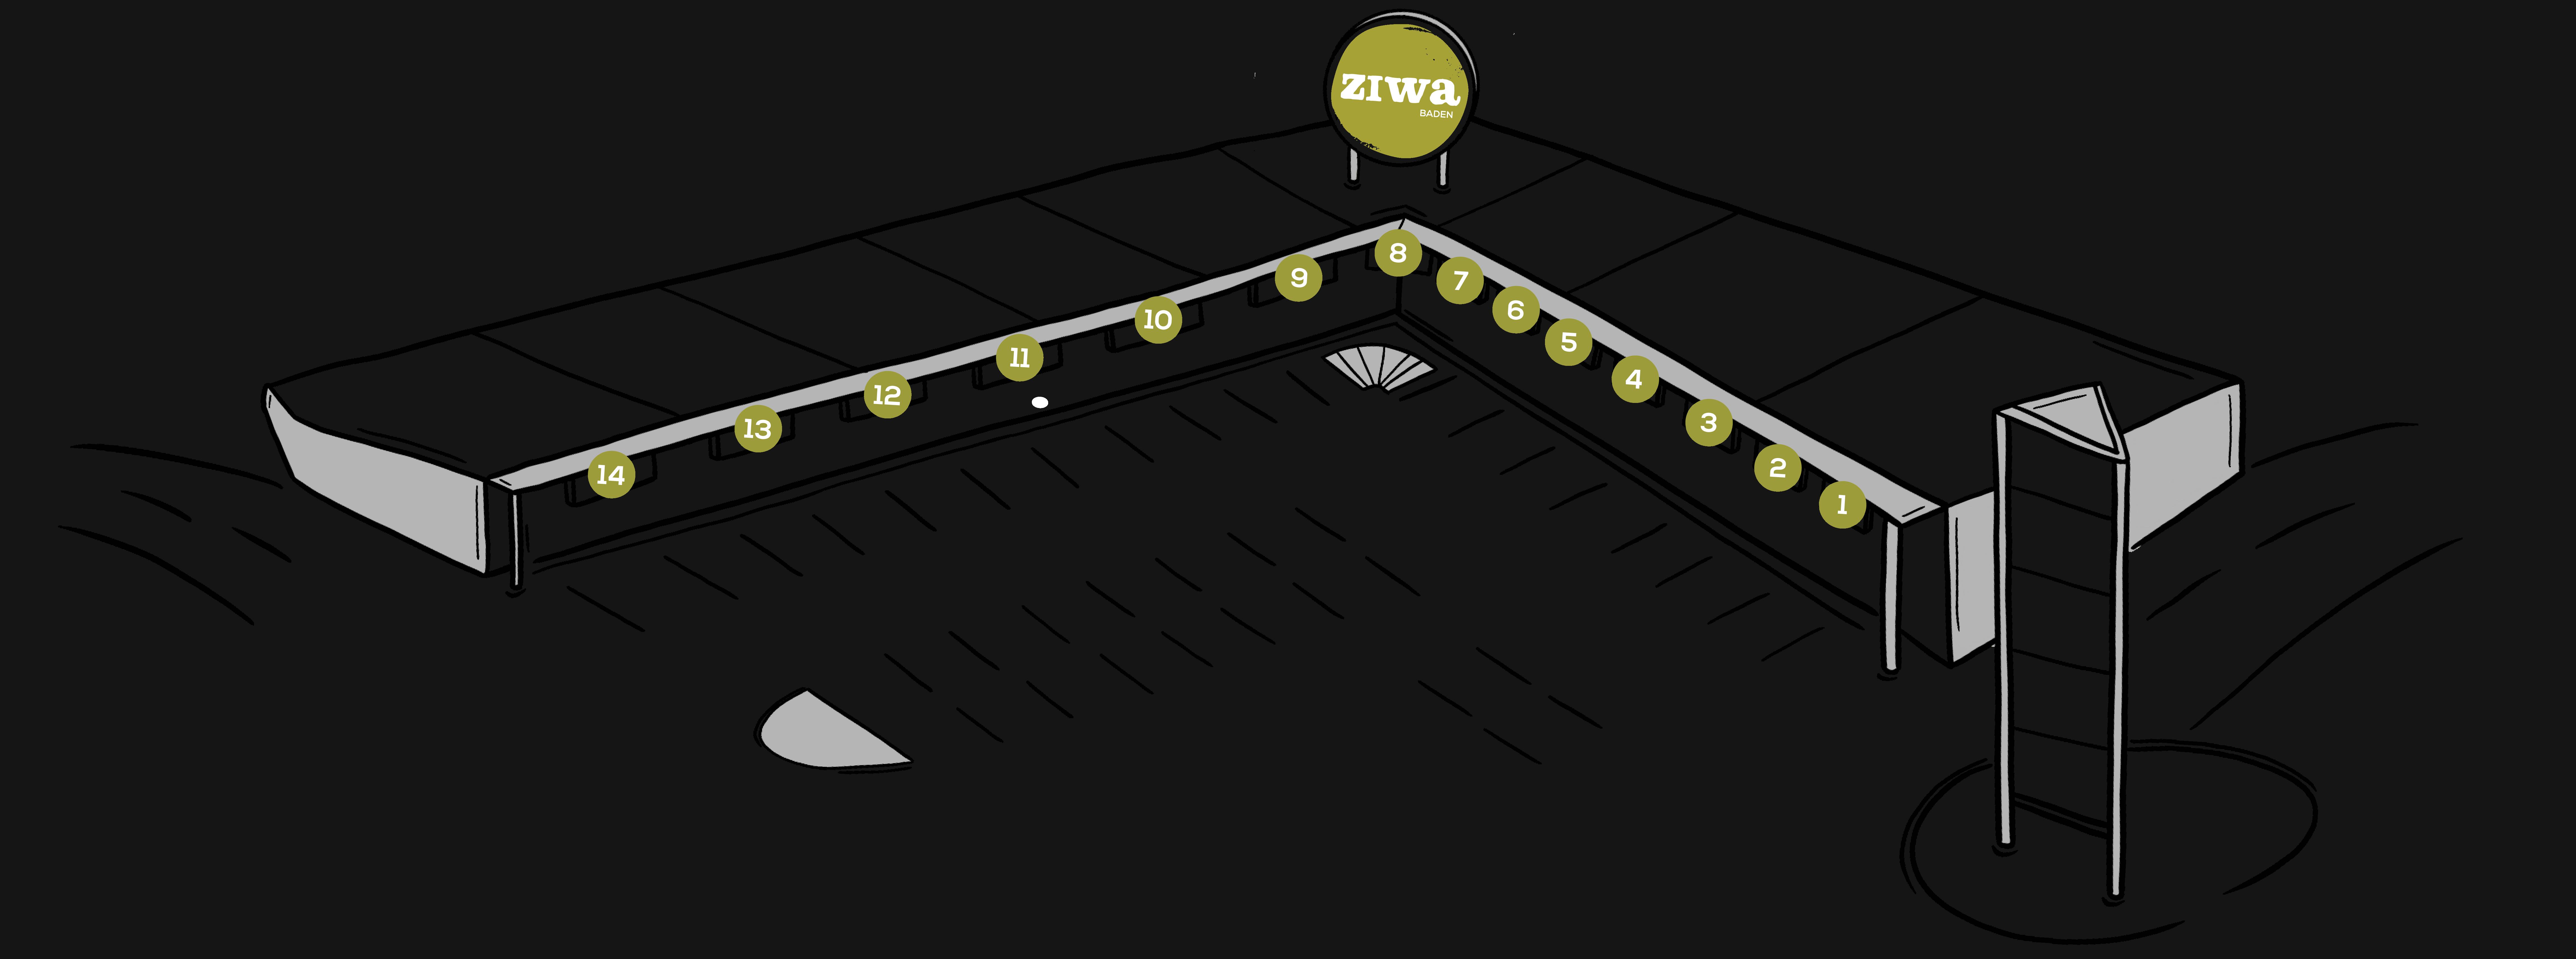 ZIWA-Baden_Shopplan